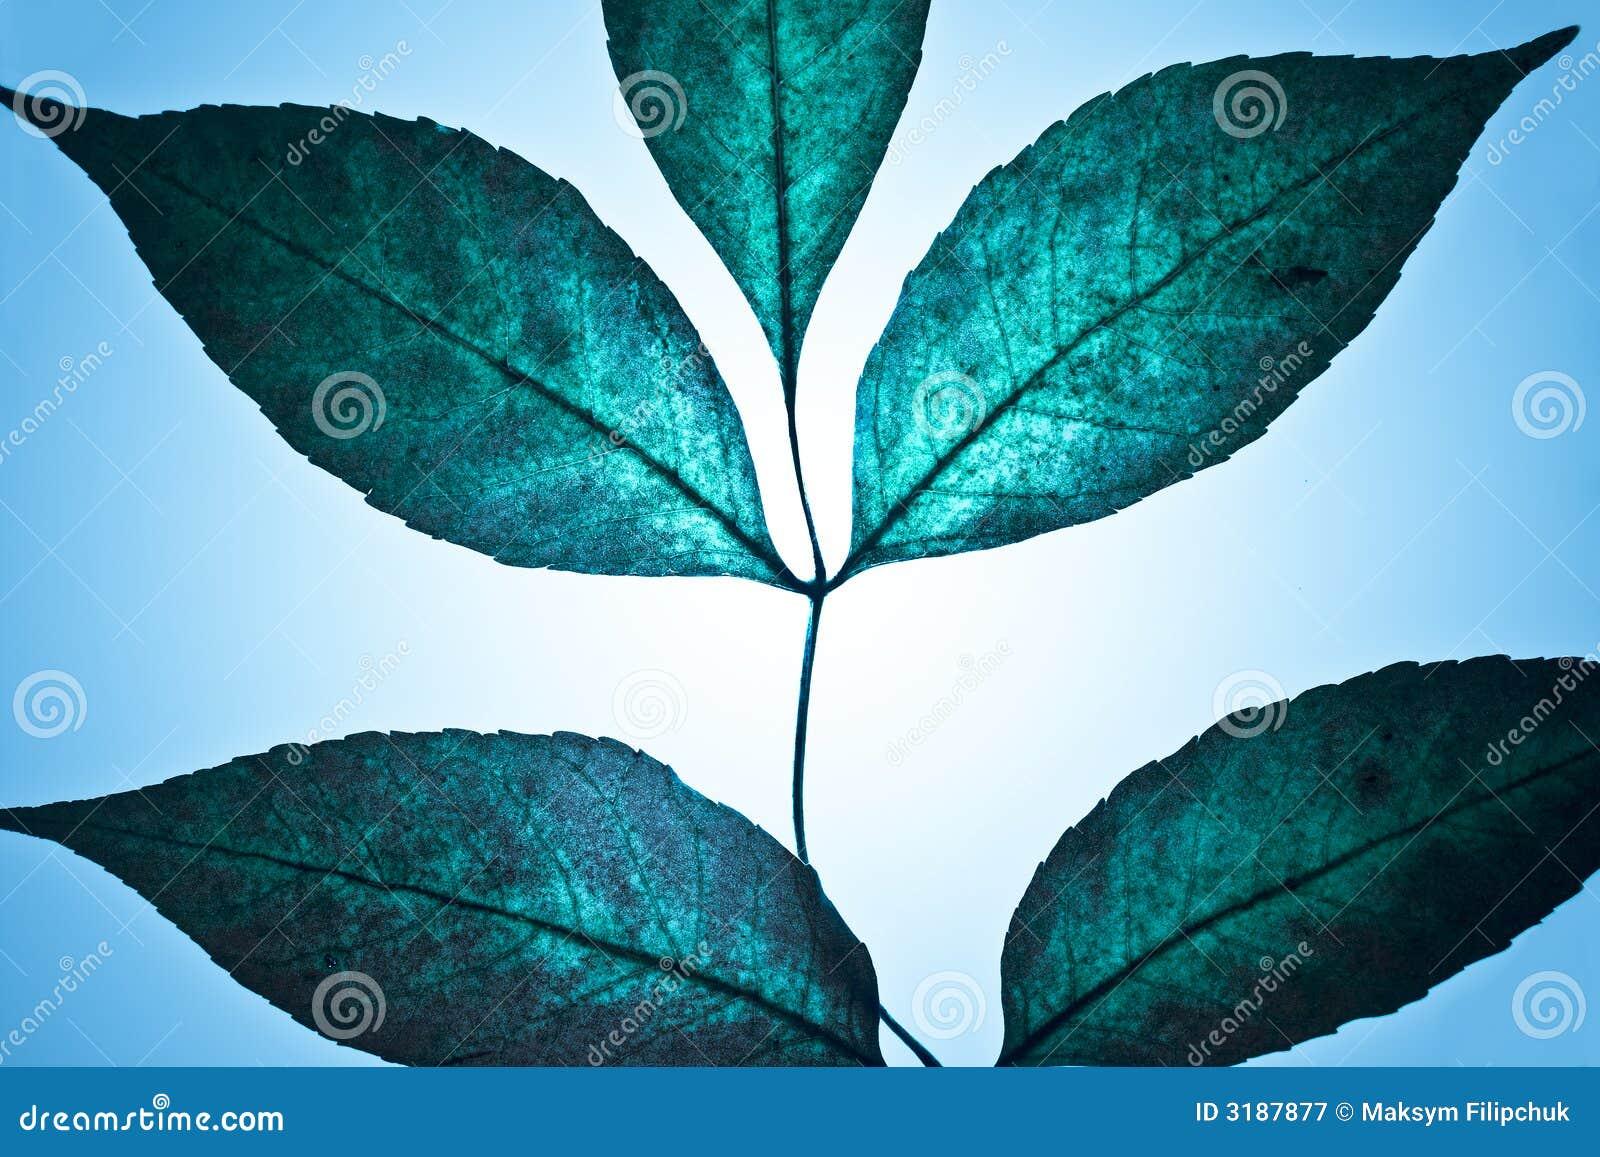 Fantastic Leaves Stock Image. Image Of Majestic